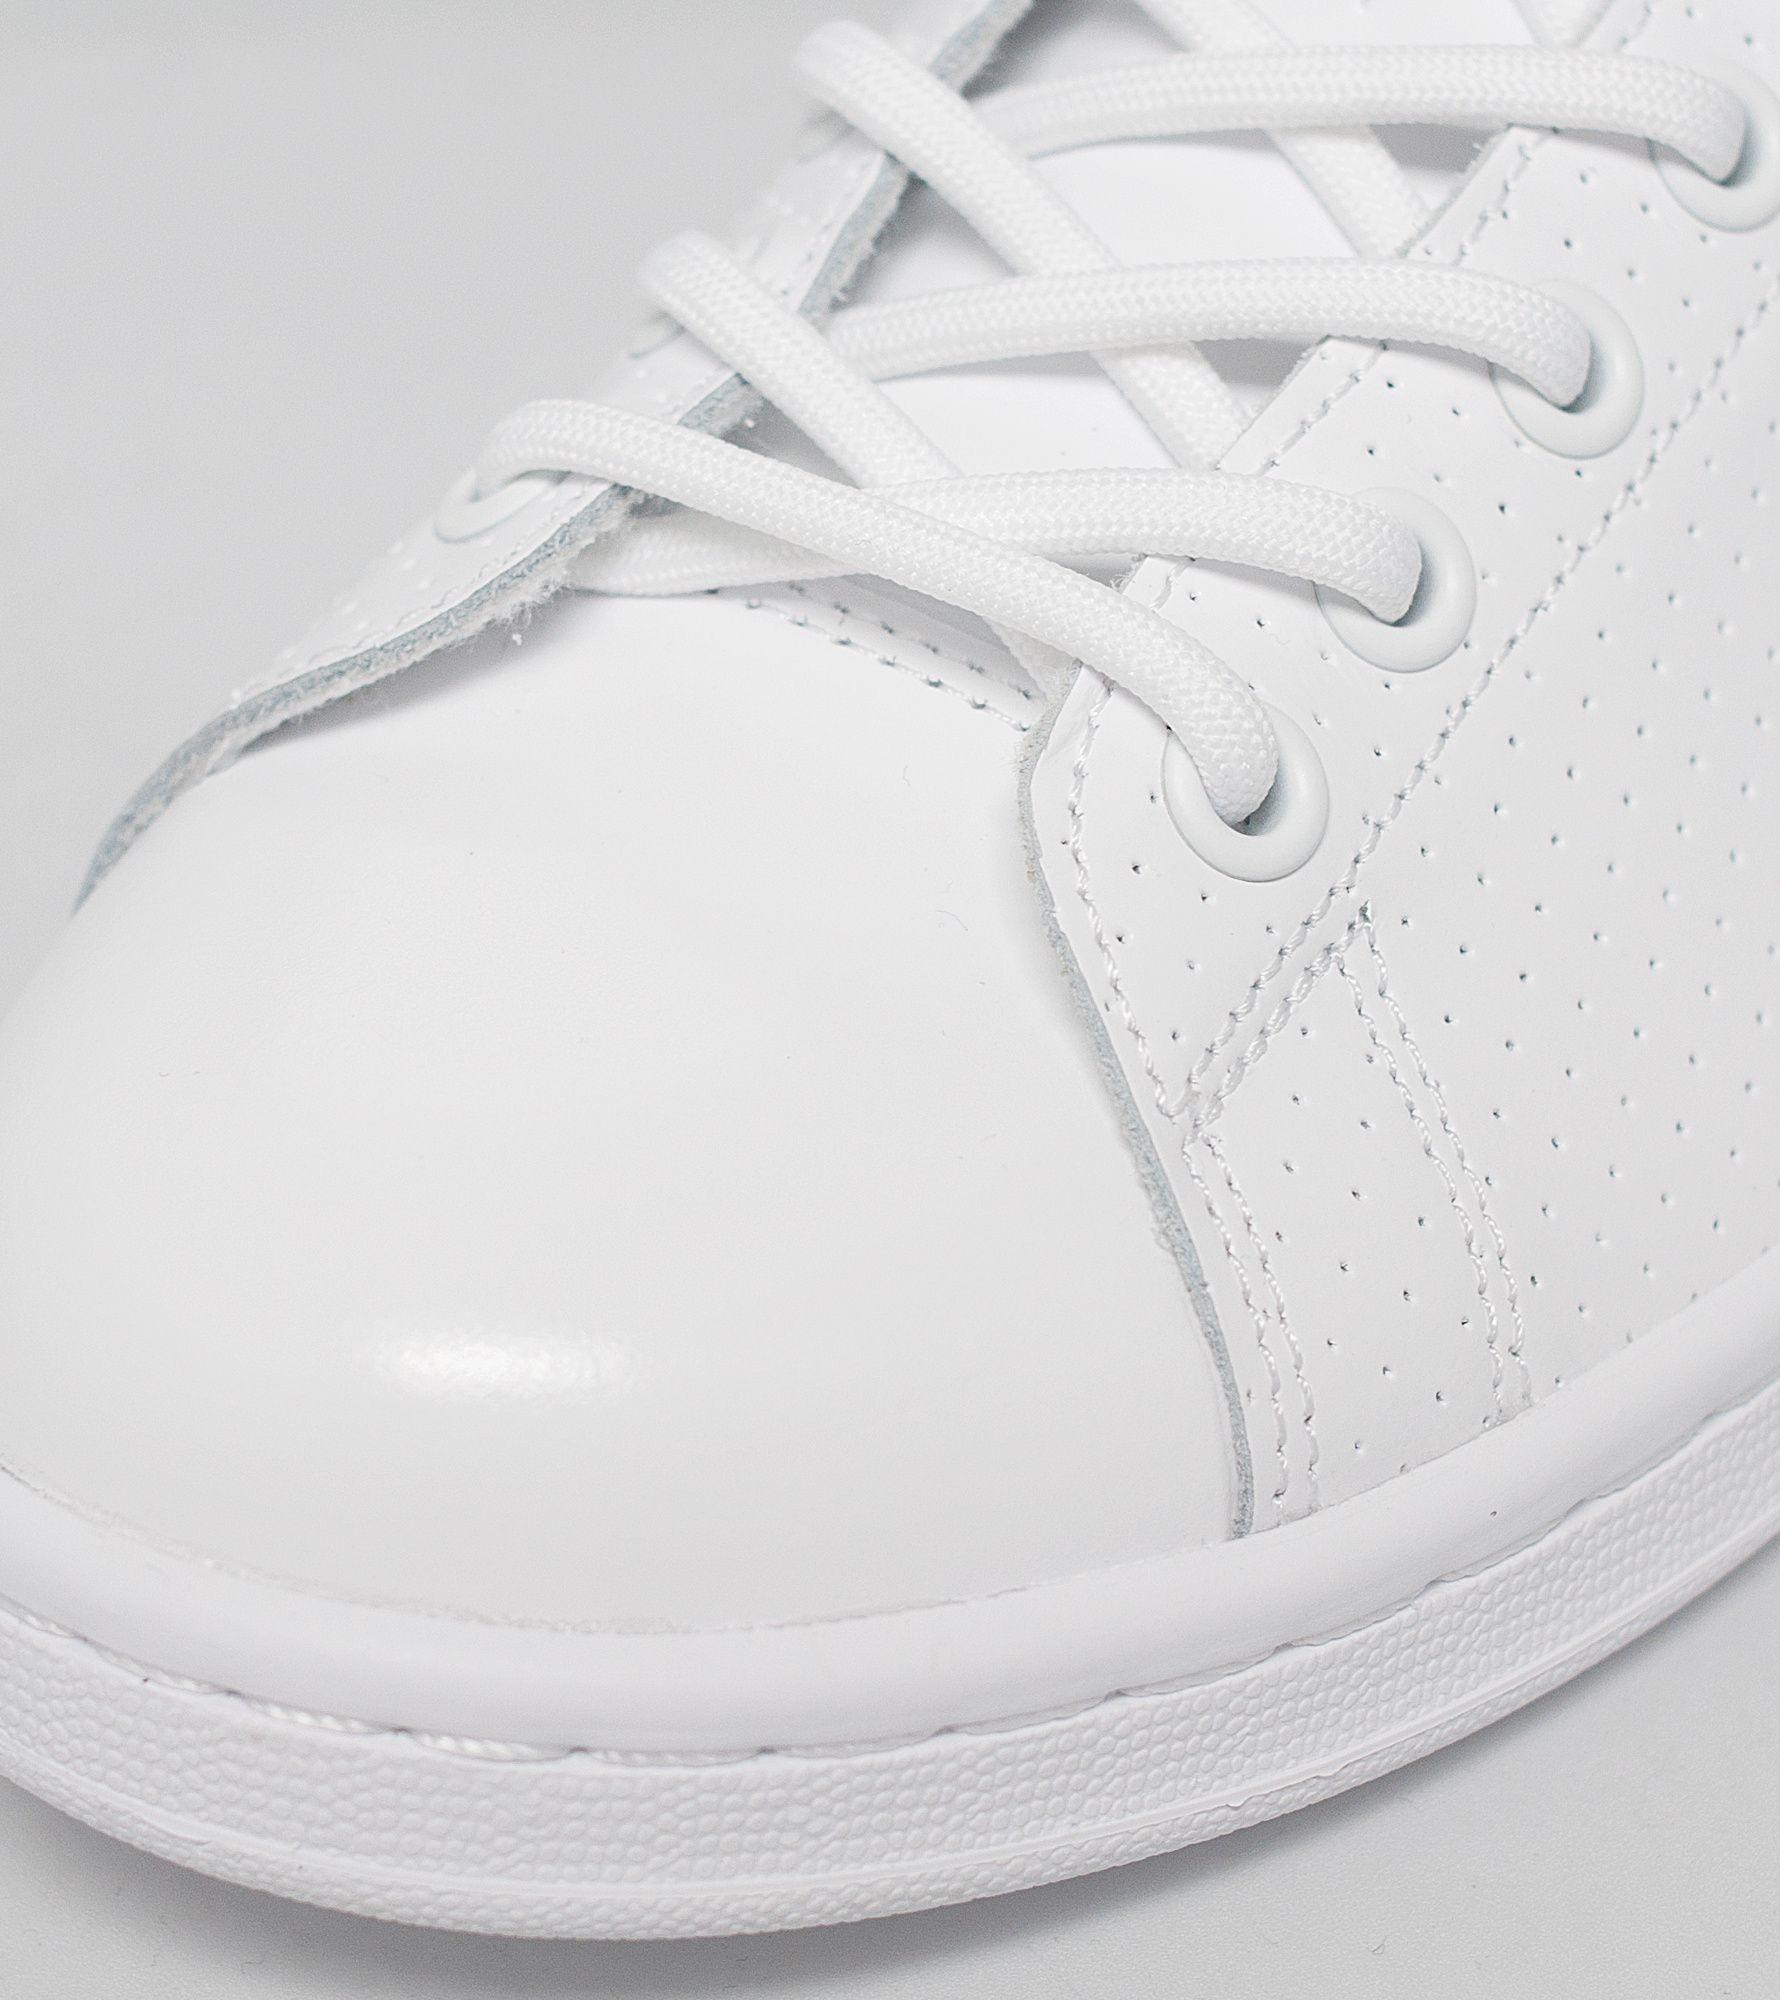 adidas Originals Stan Smith Perforated